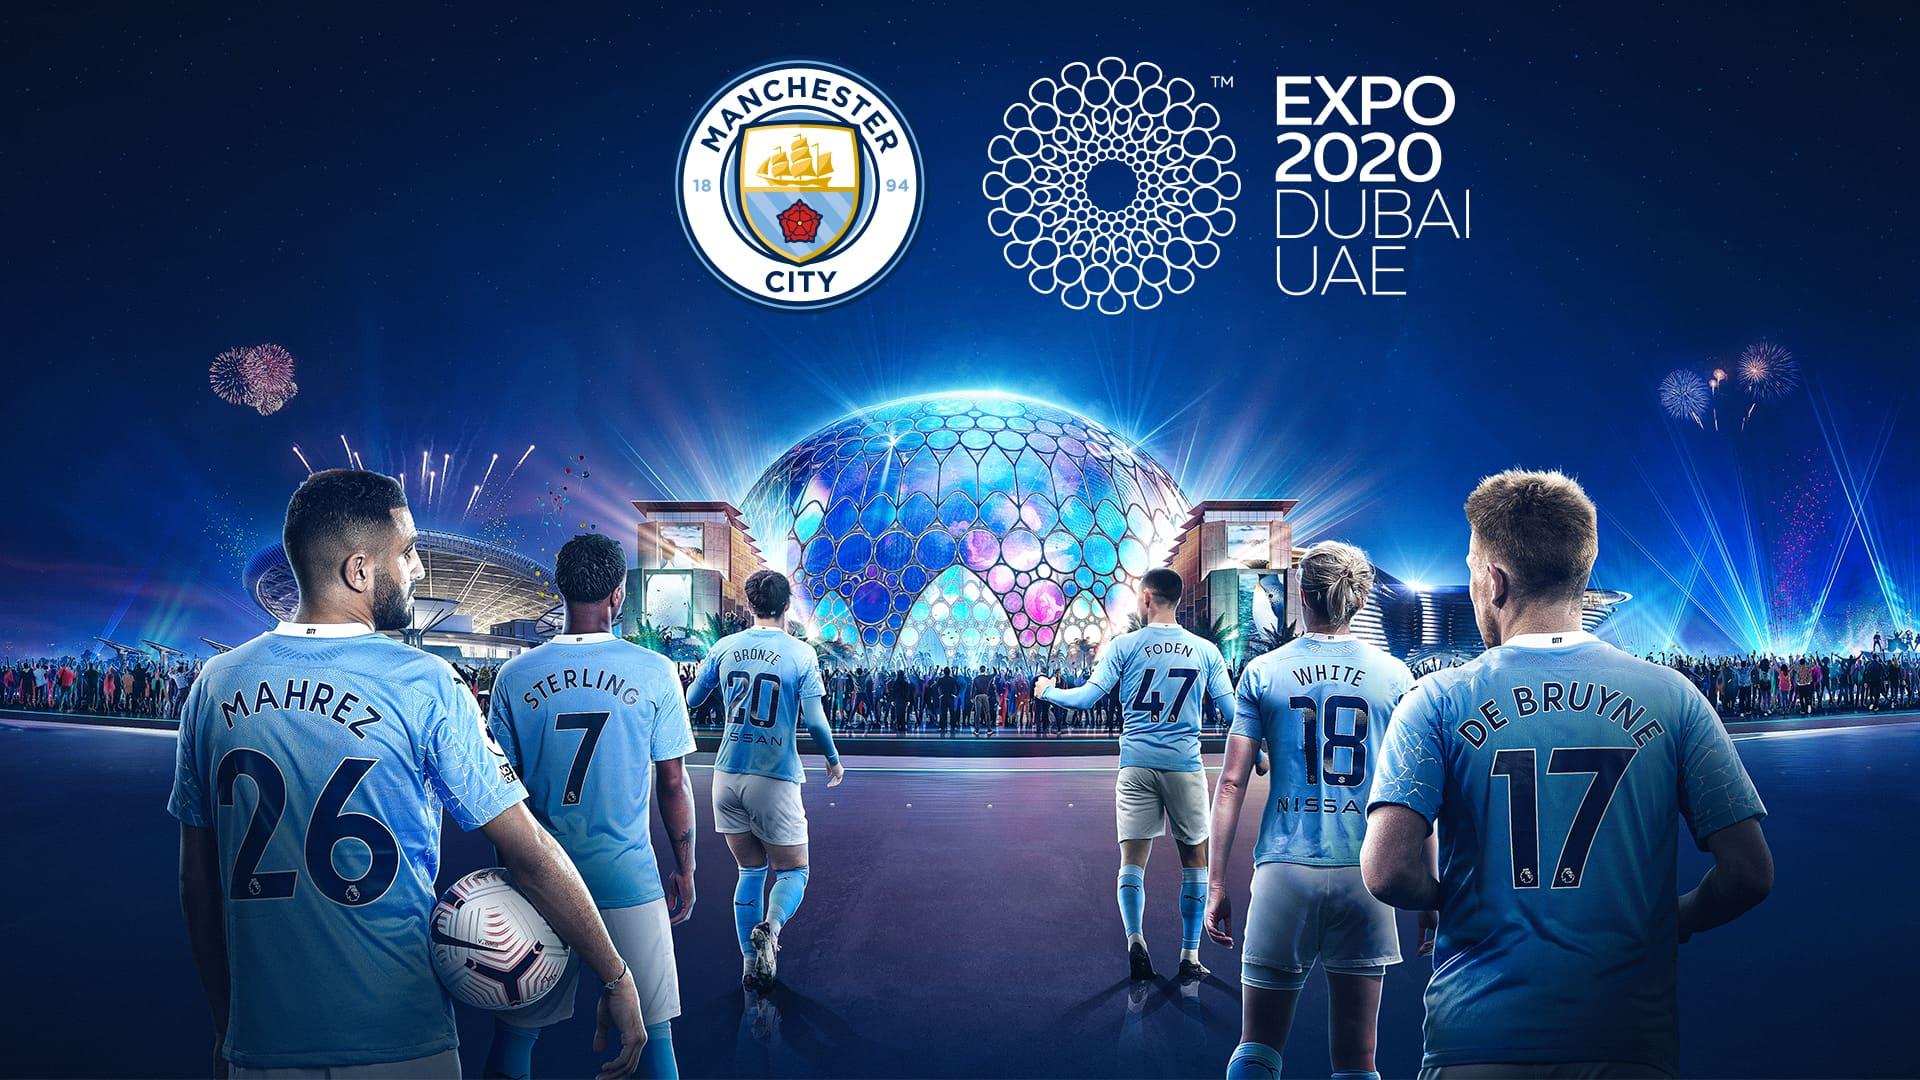 Mumbai City FC to amplify global partnership between CFG & Expo 2020 Dubai